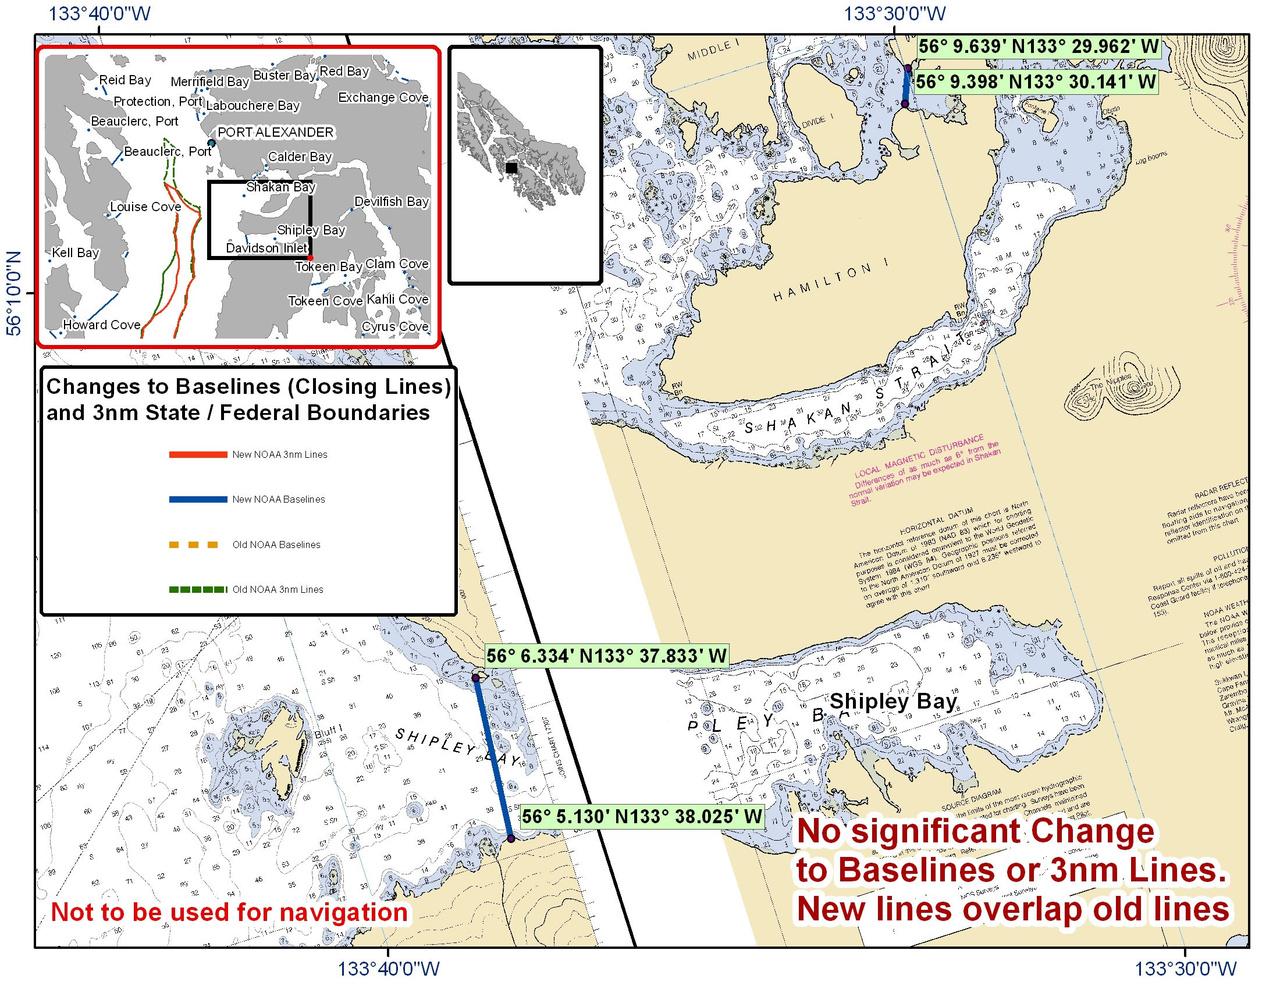 Chart for Shipley Bay